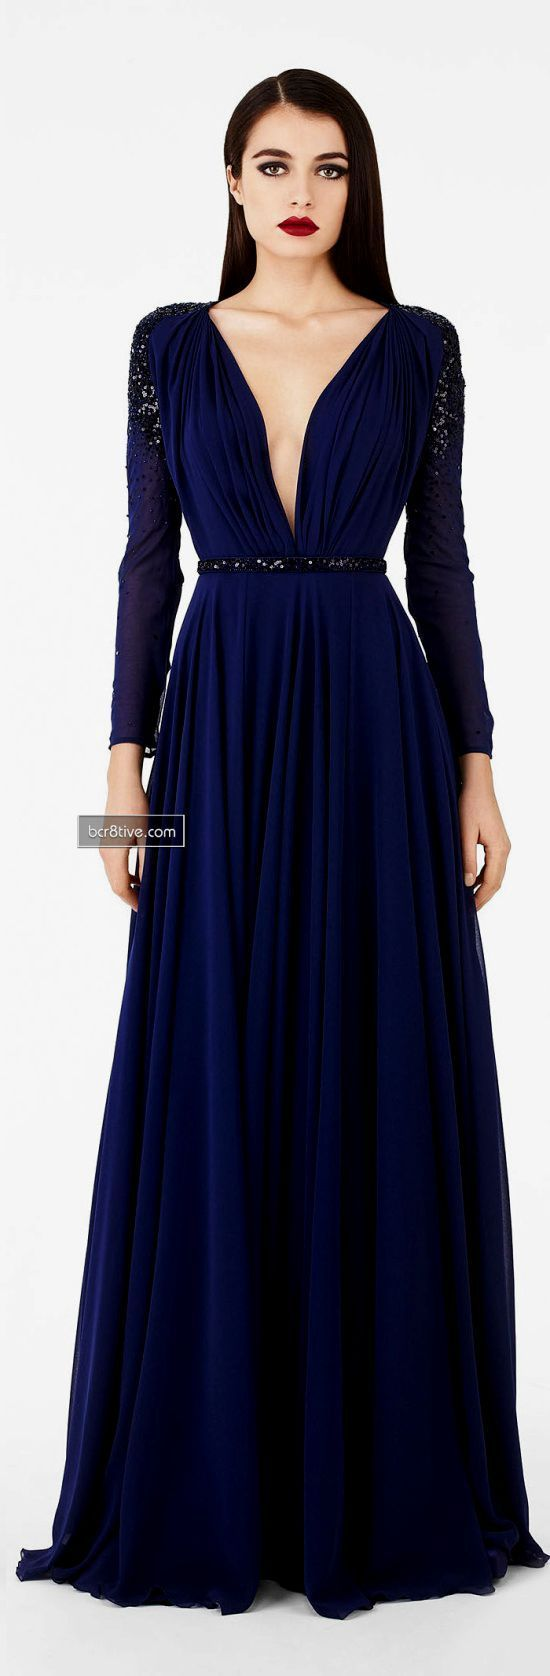 Vestido Azul Marino Maquillaje